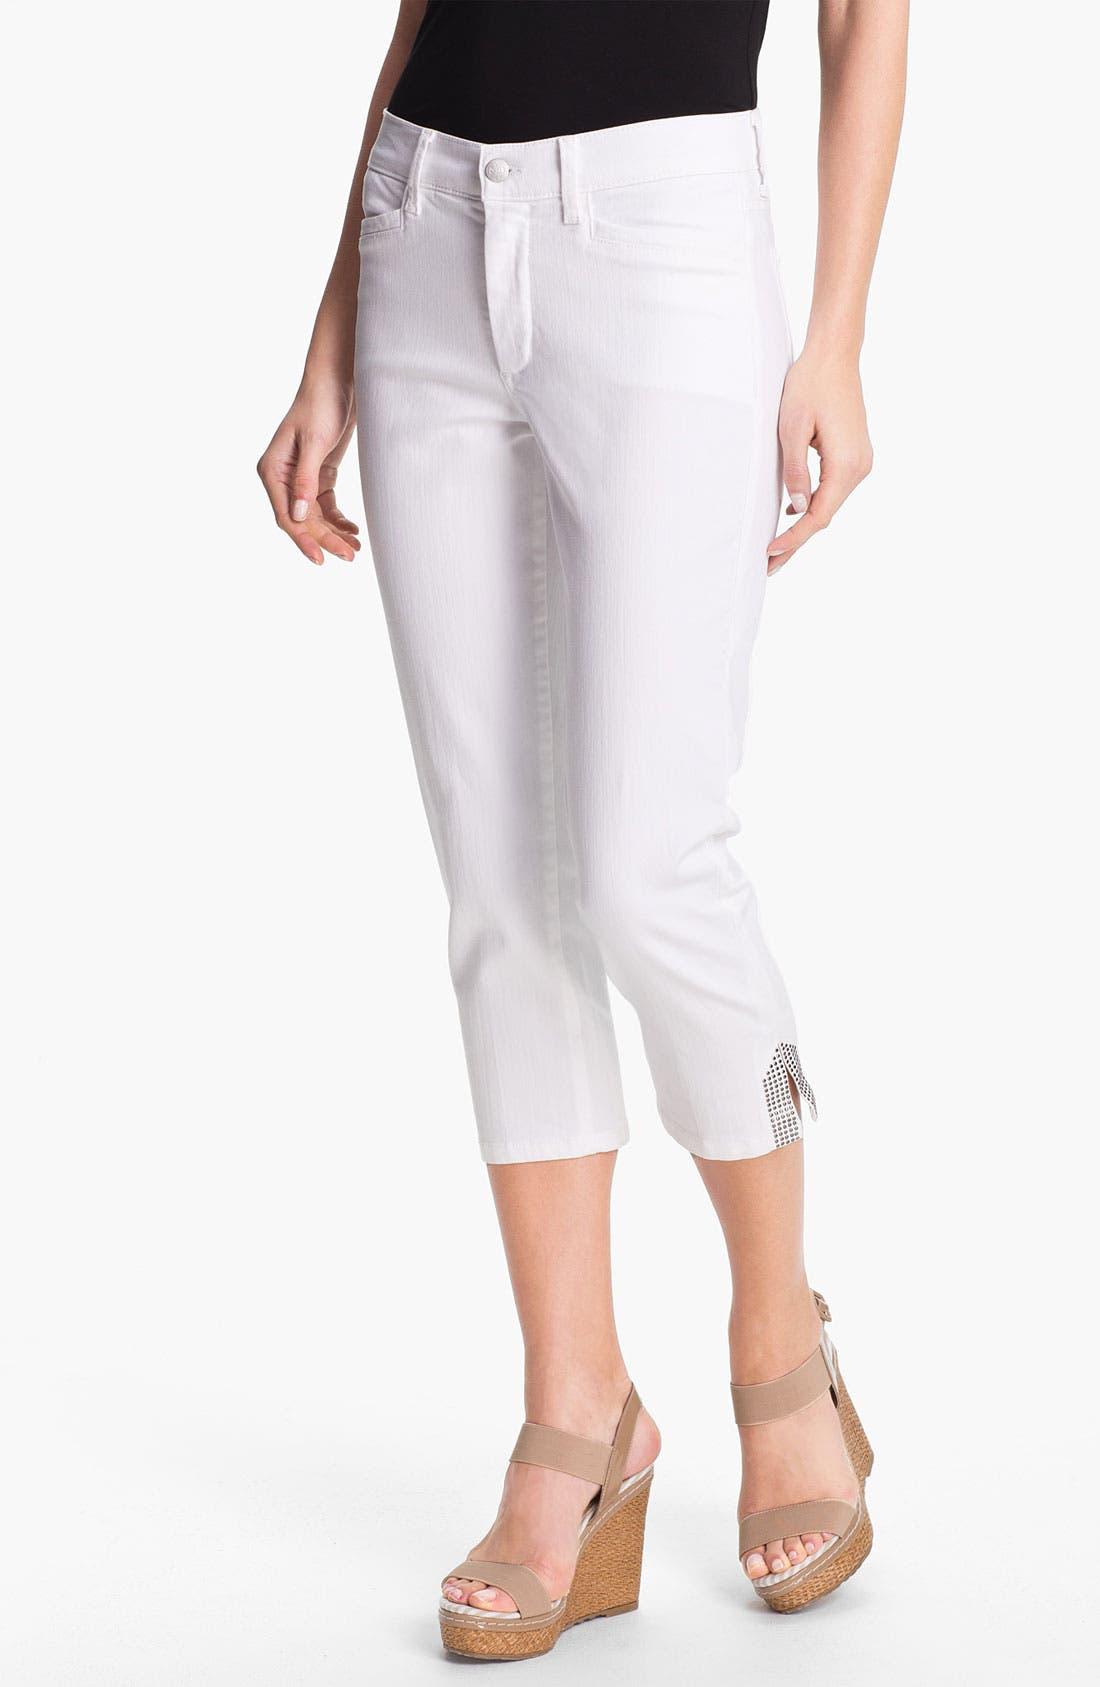 Alternate Image 1 Selected - NYDJ 'Suzy' Embellished Crop Jeans